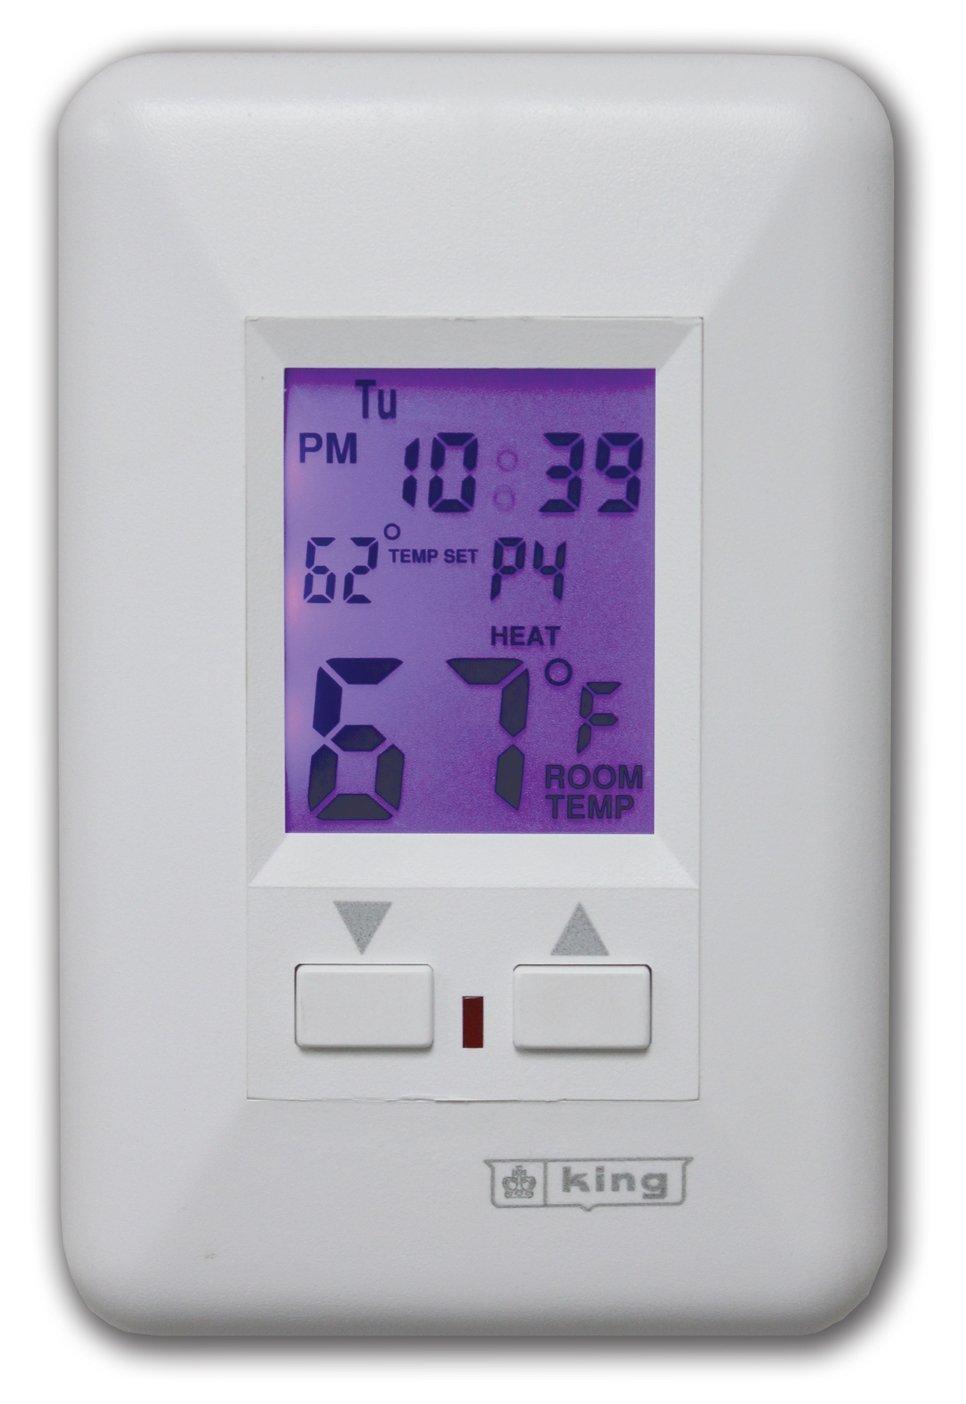 King Thermostat Wiring Diagram